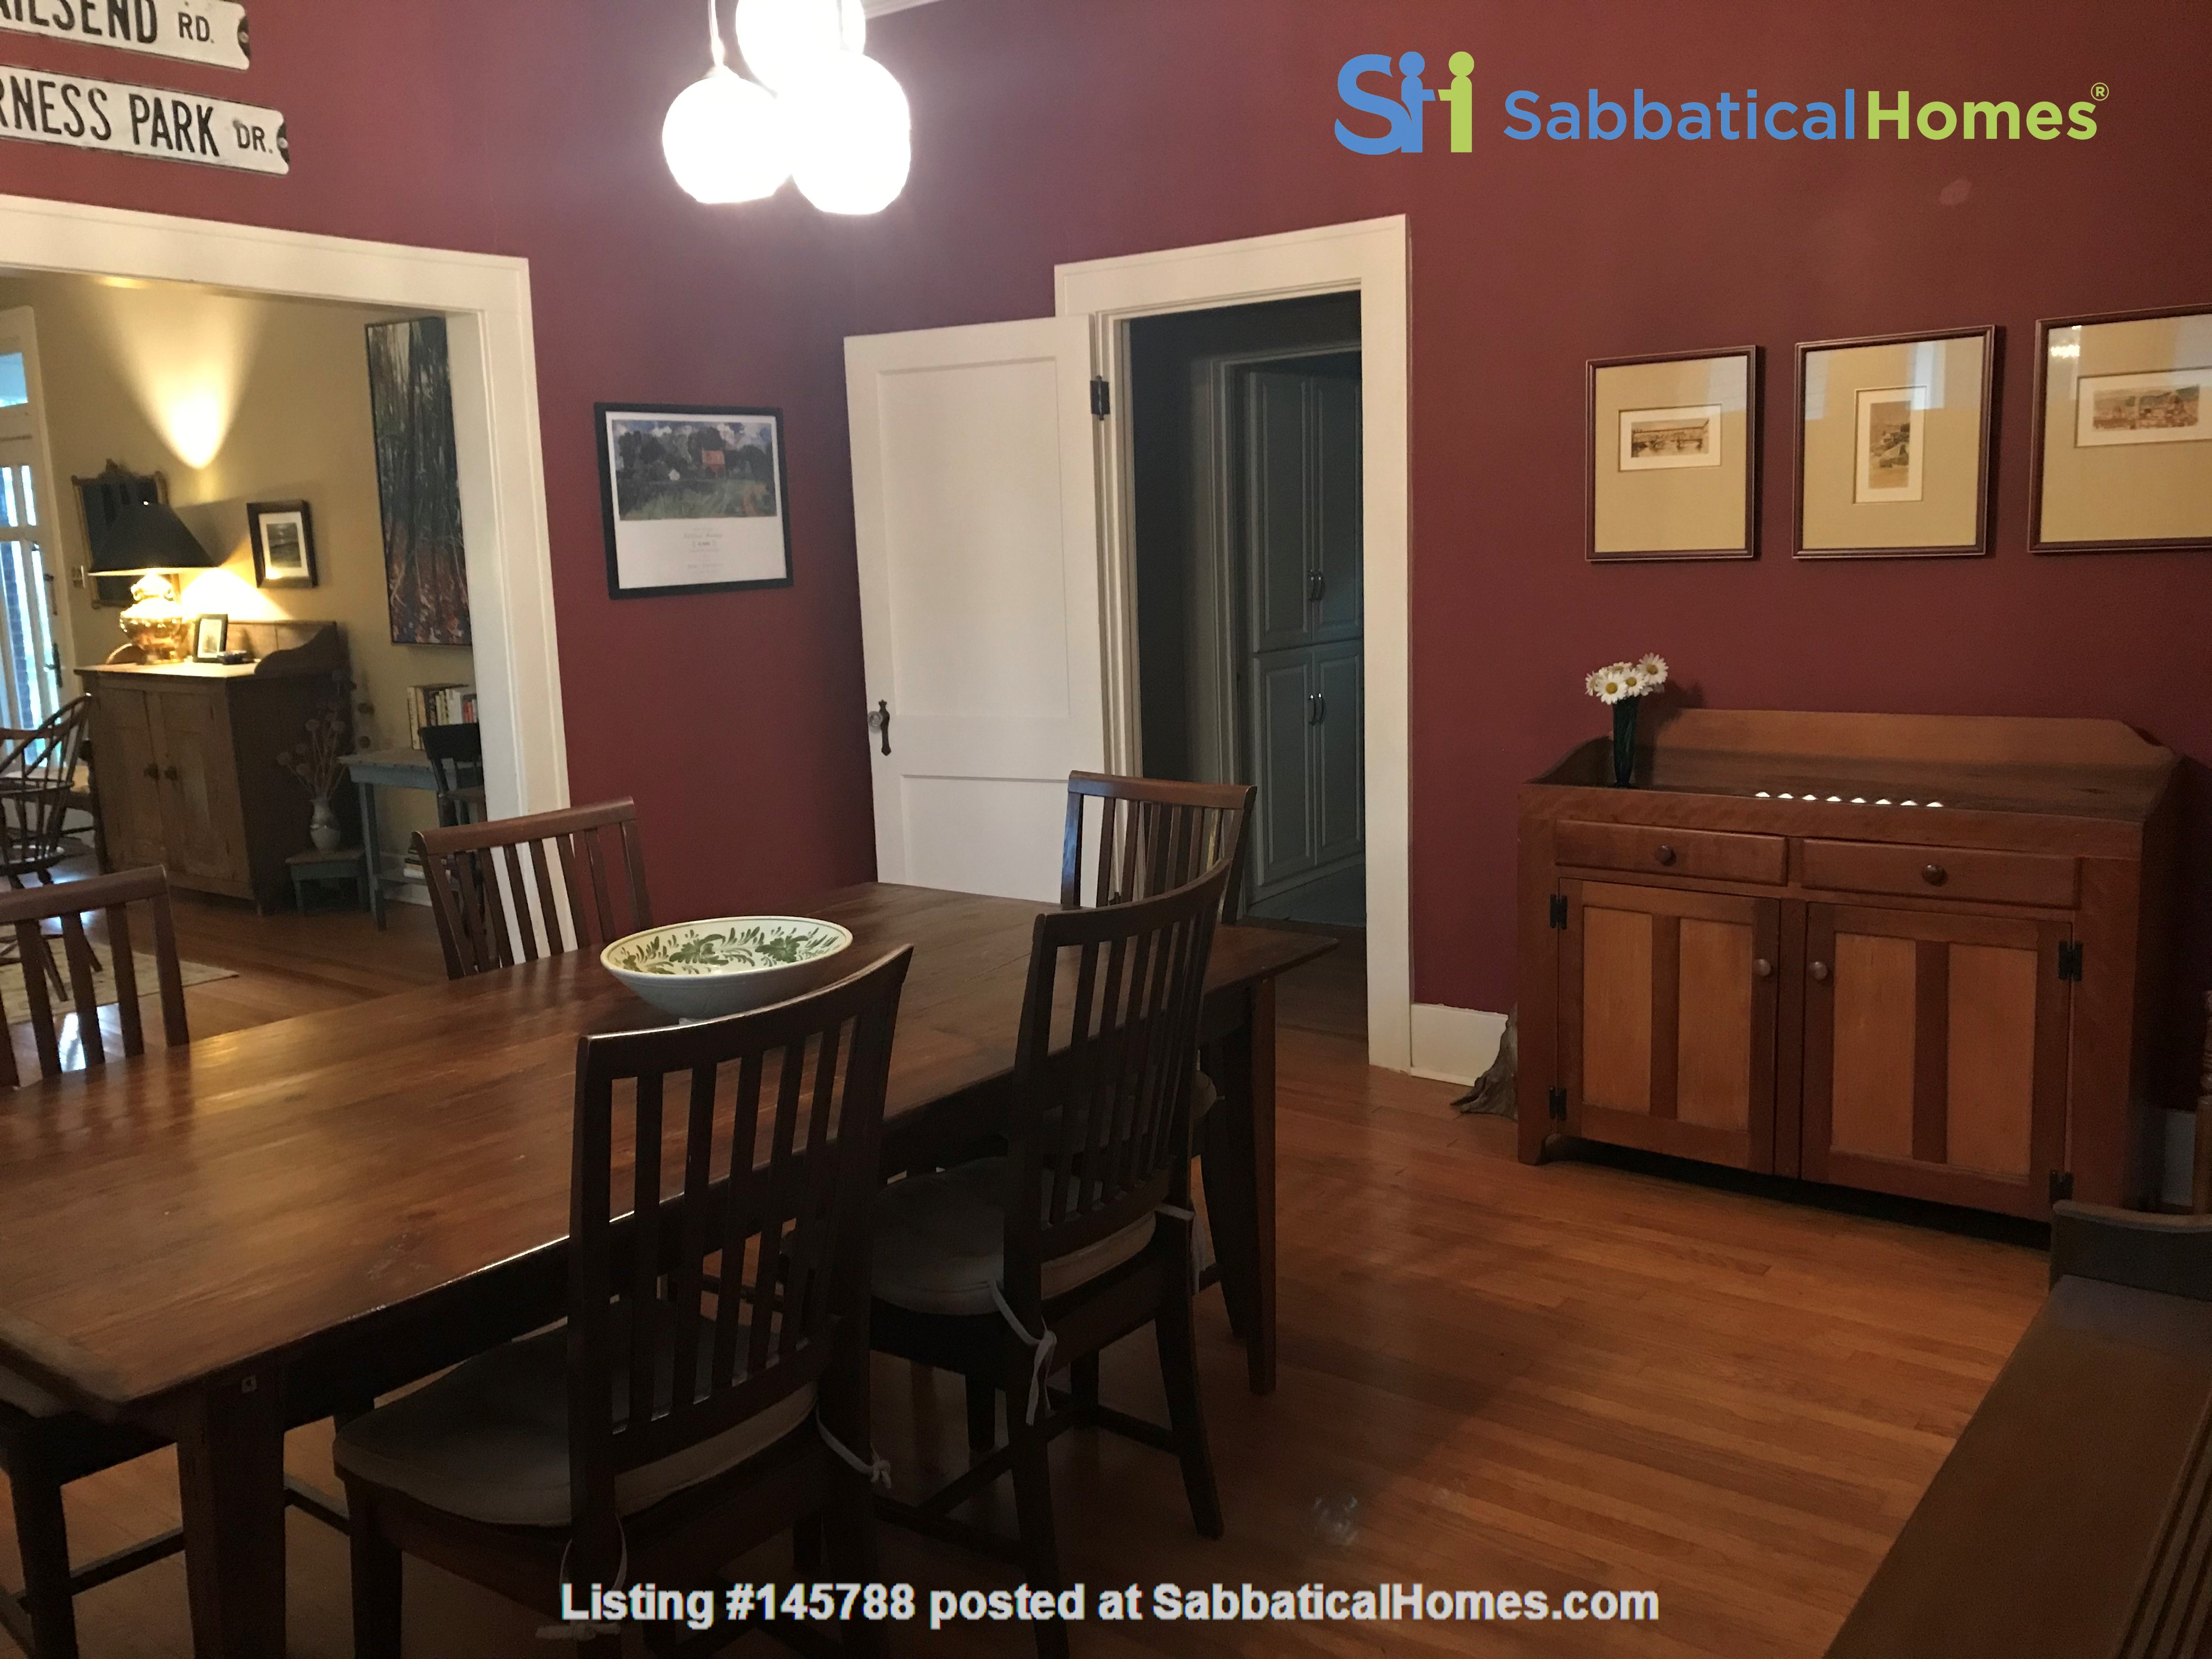 Charming 3 bedroom bungalow in Baton Rouge, Louisiana near LSU Home Rental in Baton Rouge 3